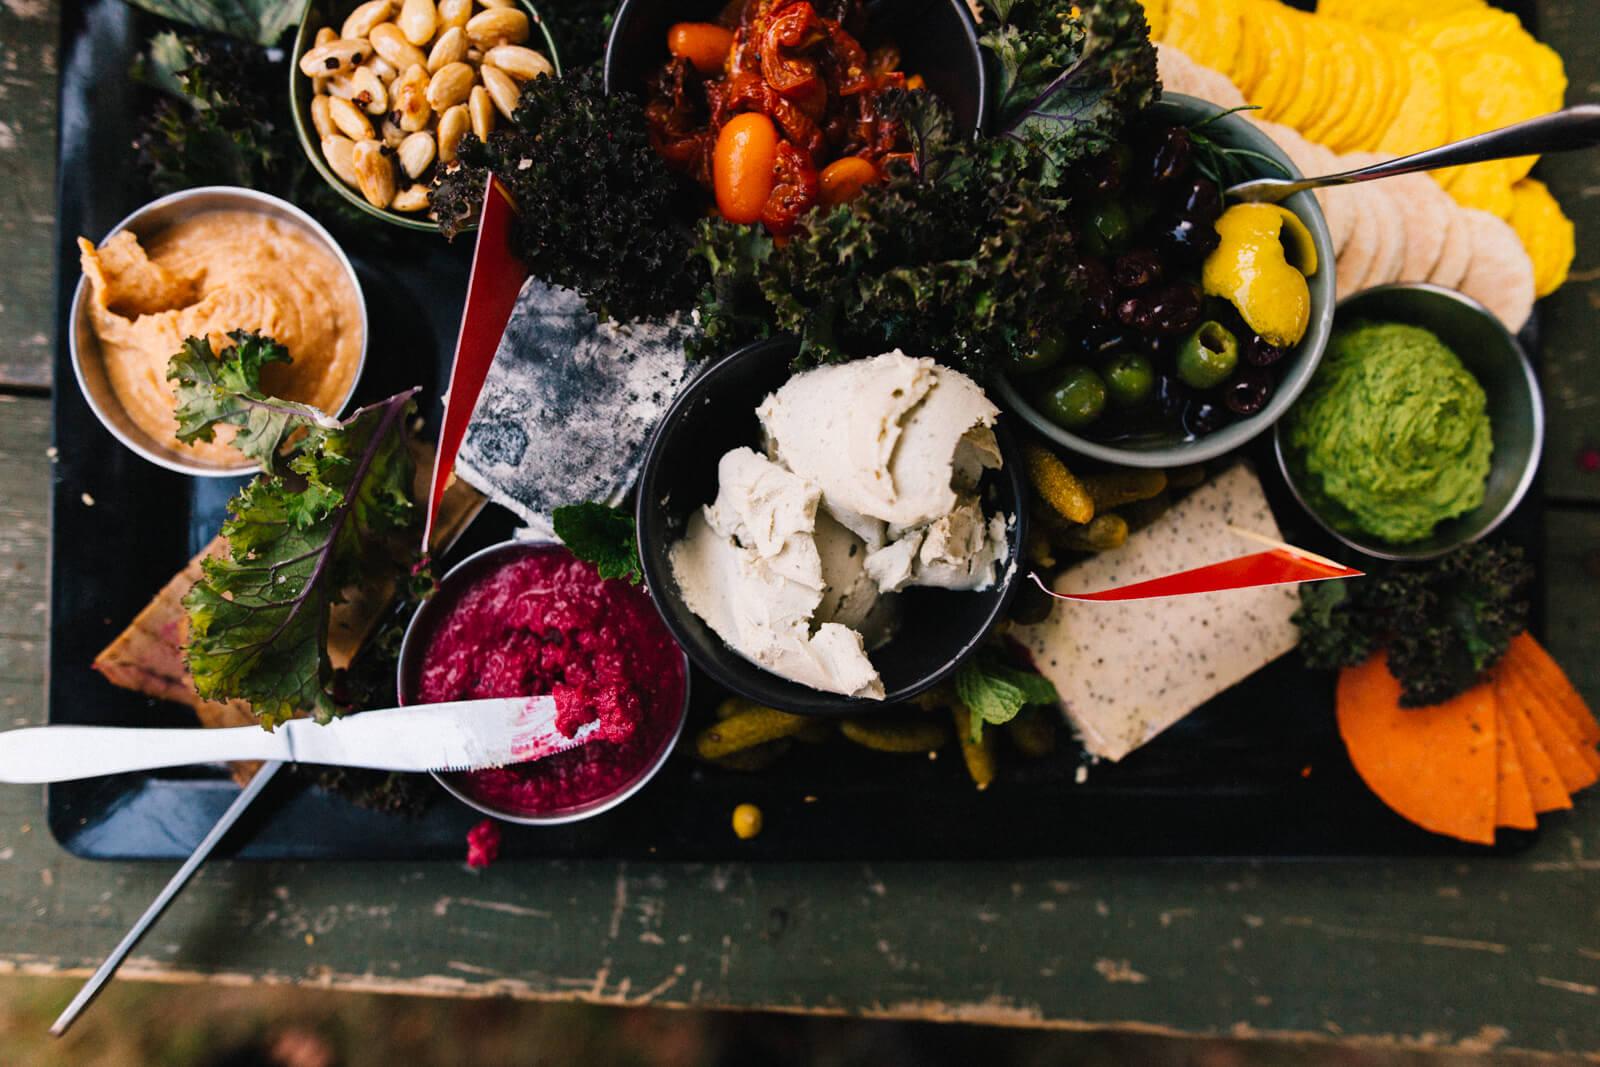 vegan grazing platters